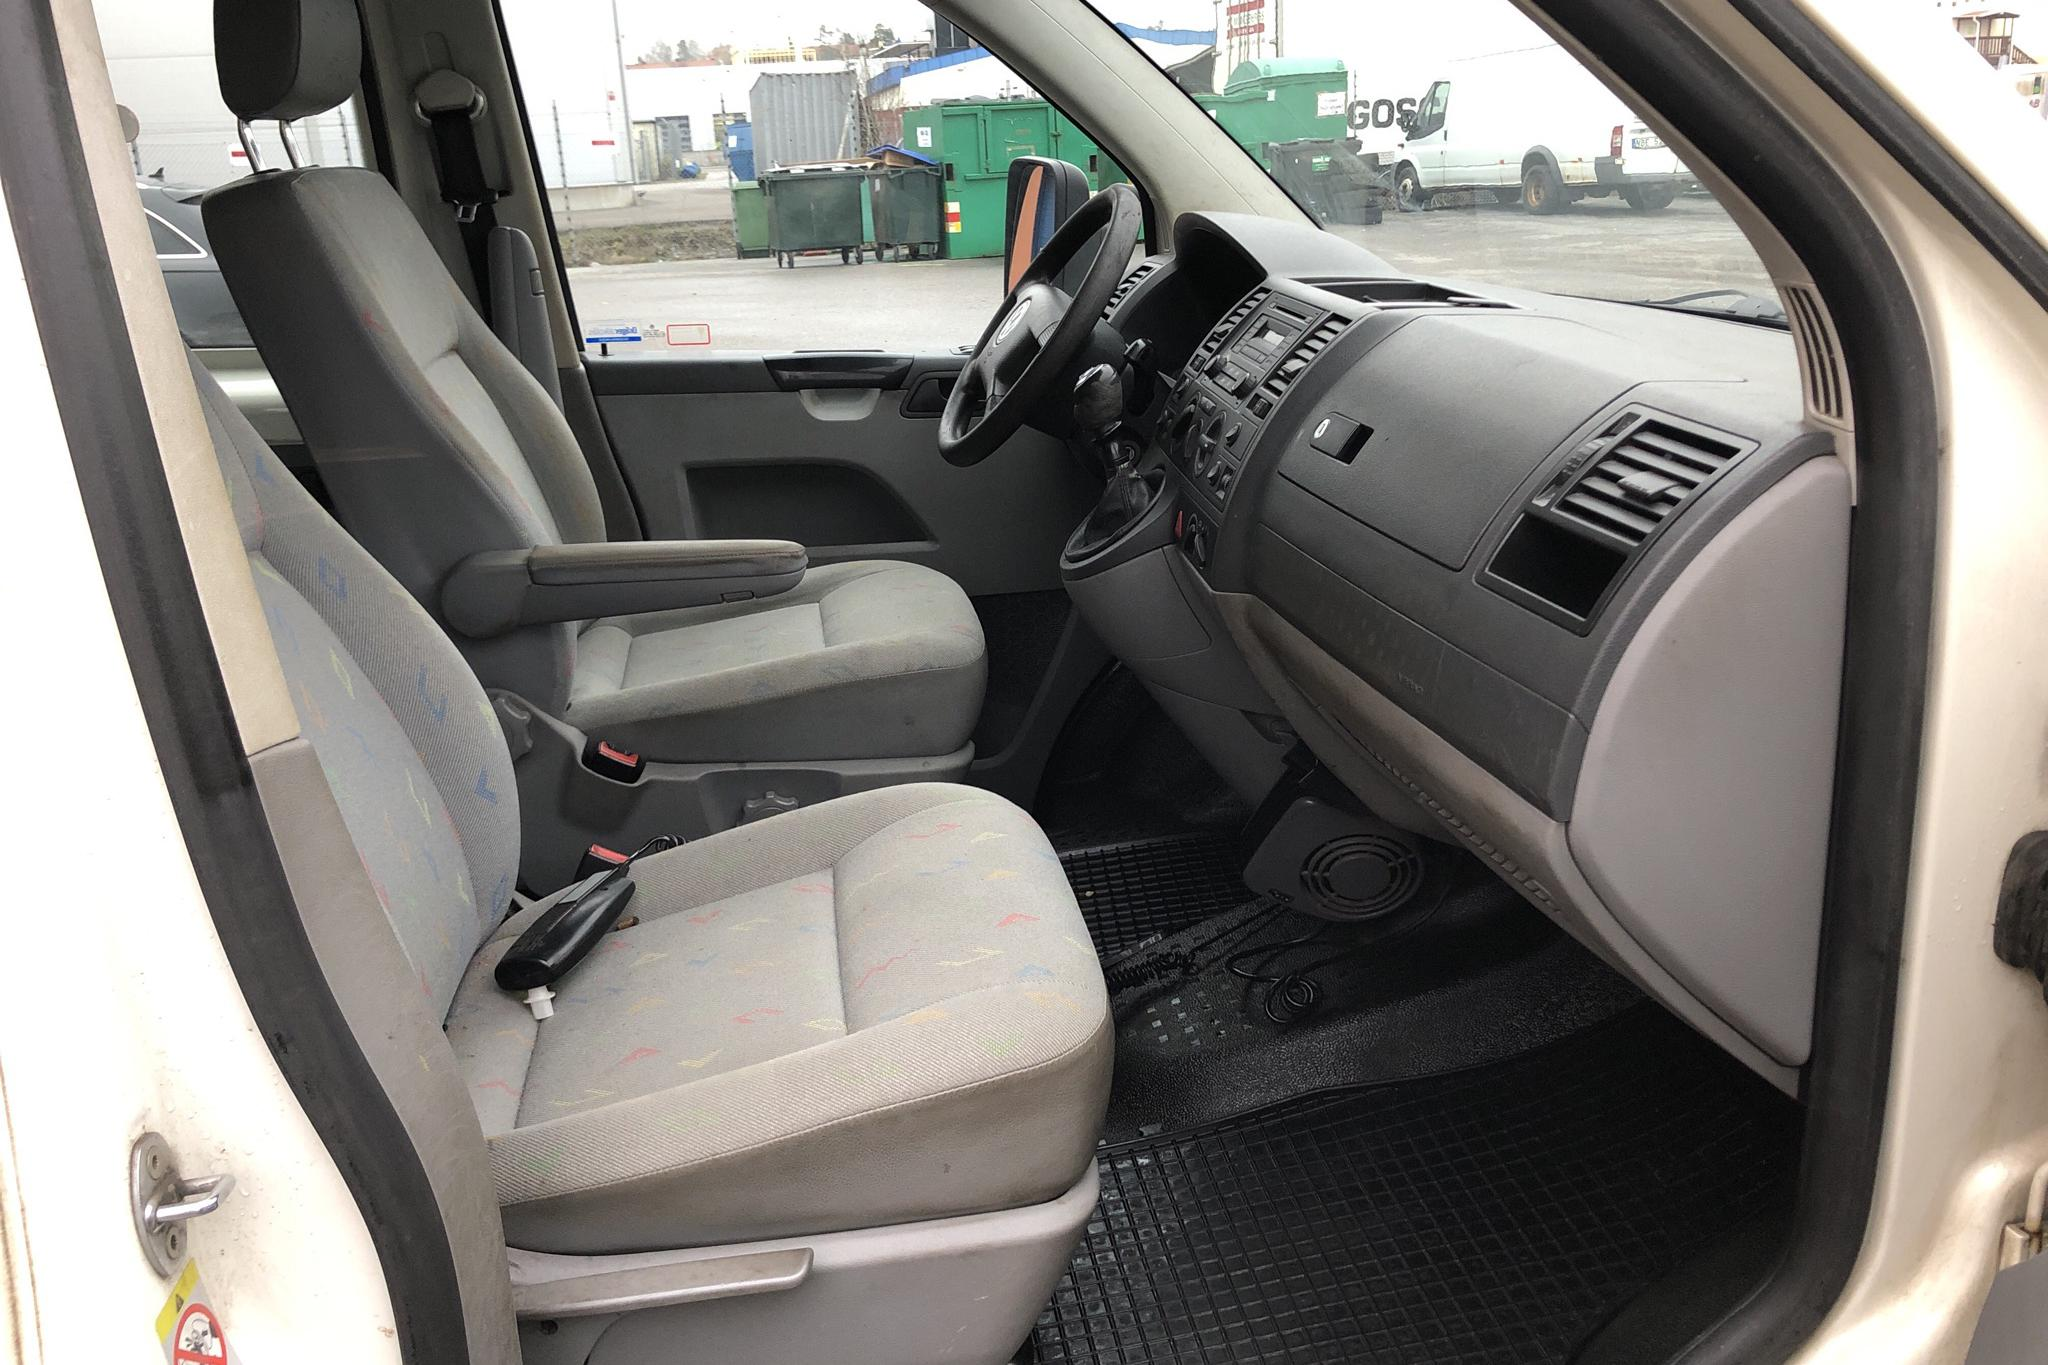 VW Transporter T5 2.5 TDI Pickup 4-motion (130hk) - 136 310 km - Manual - 2007